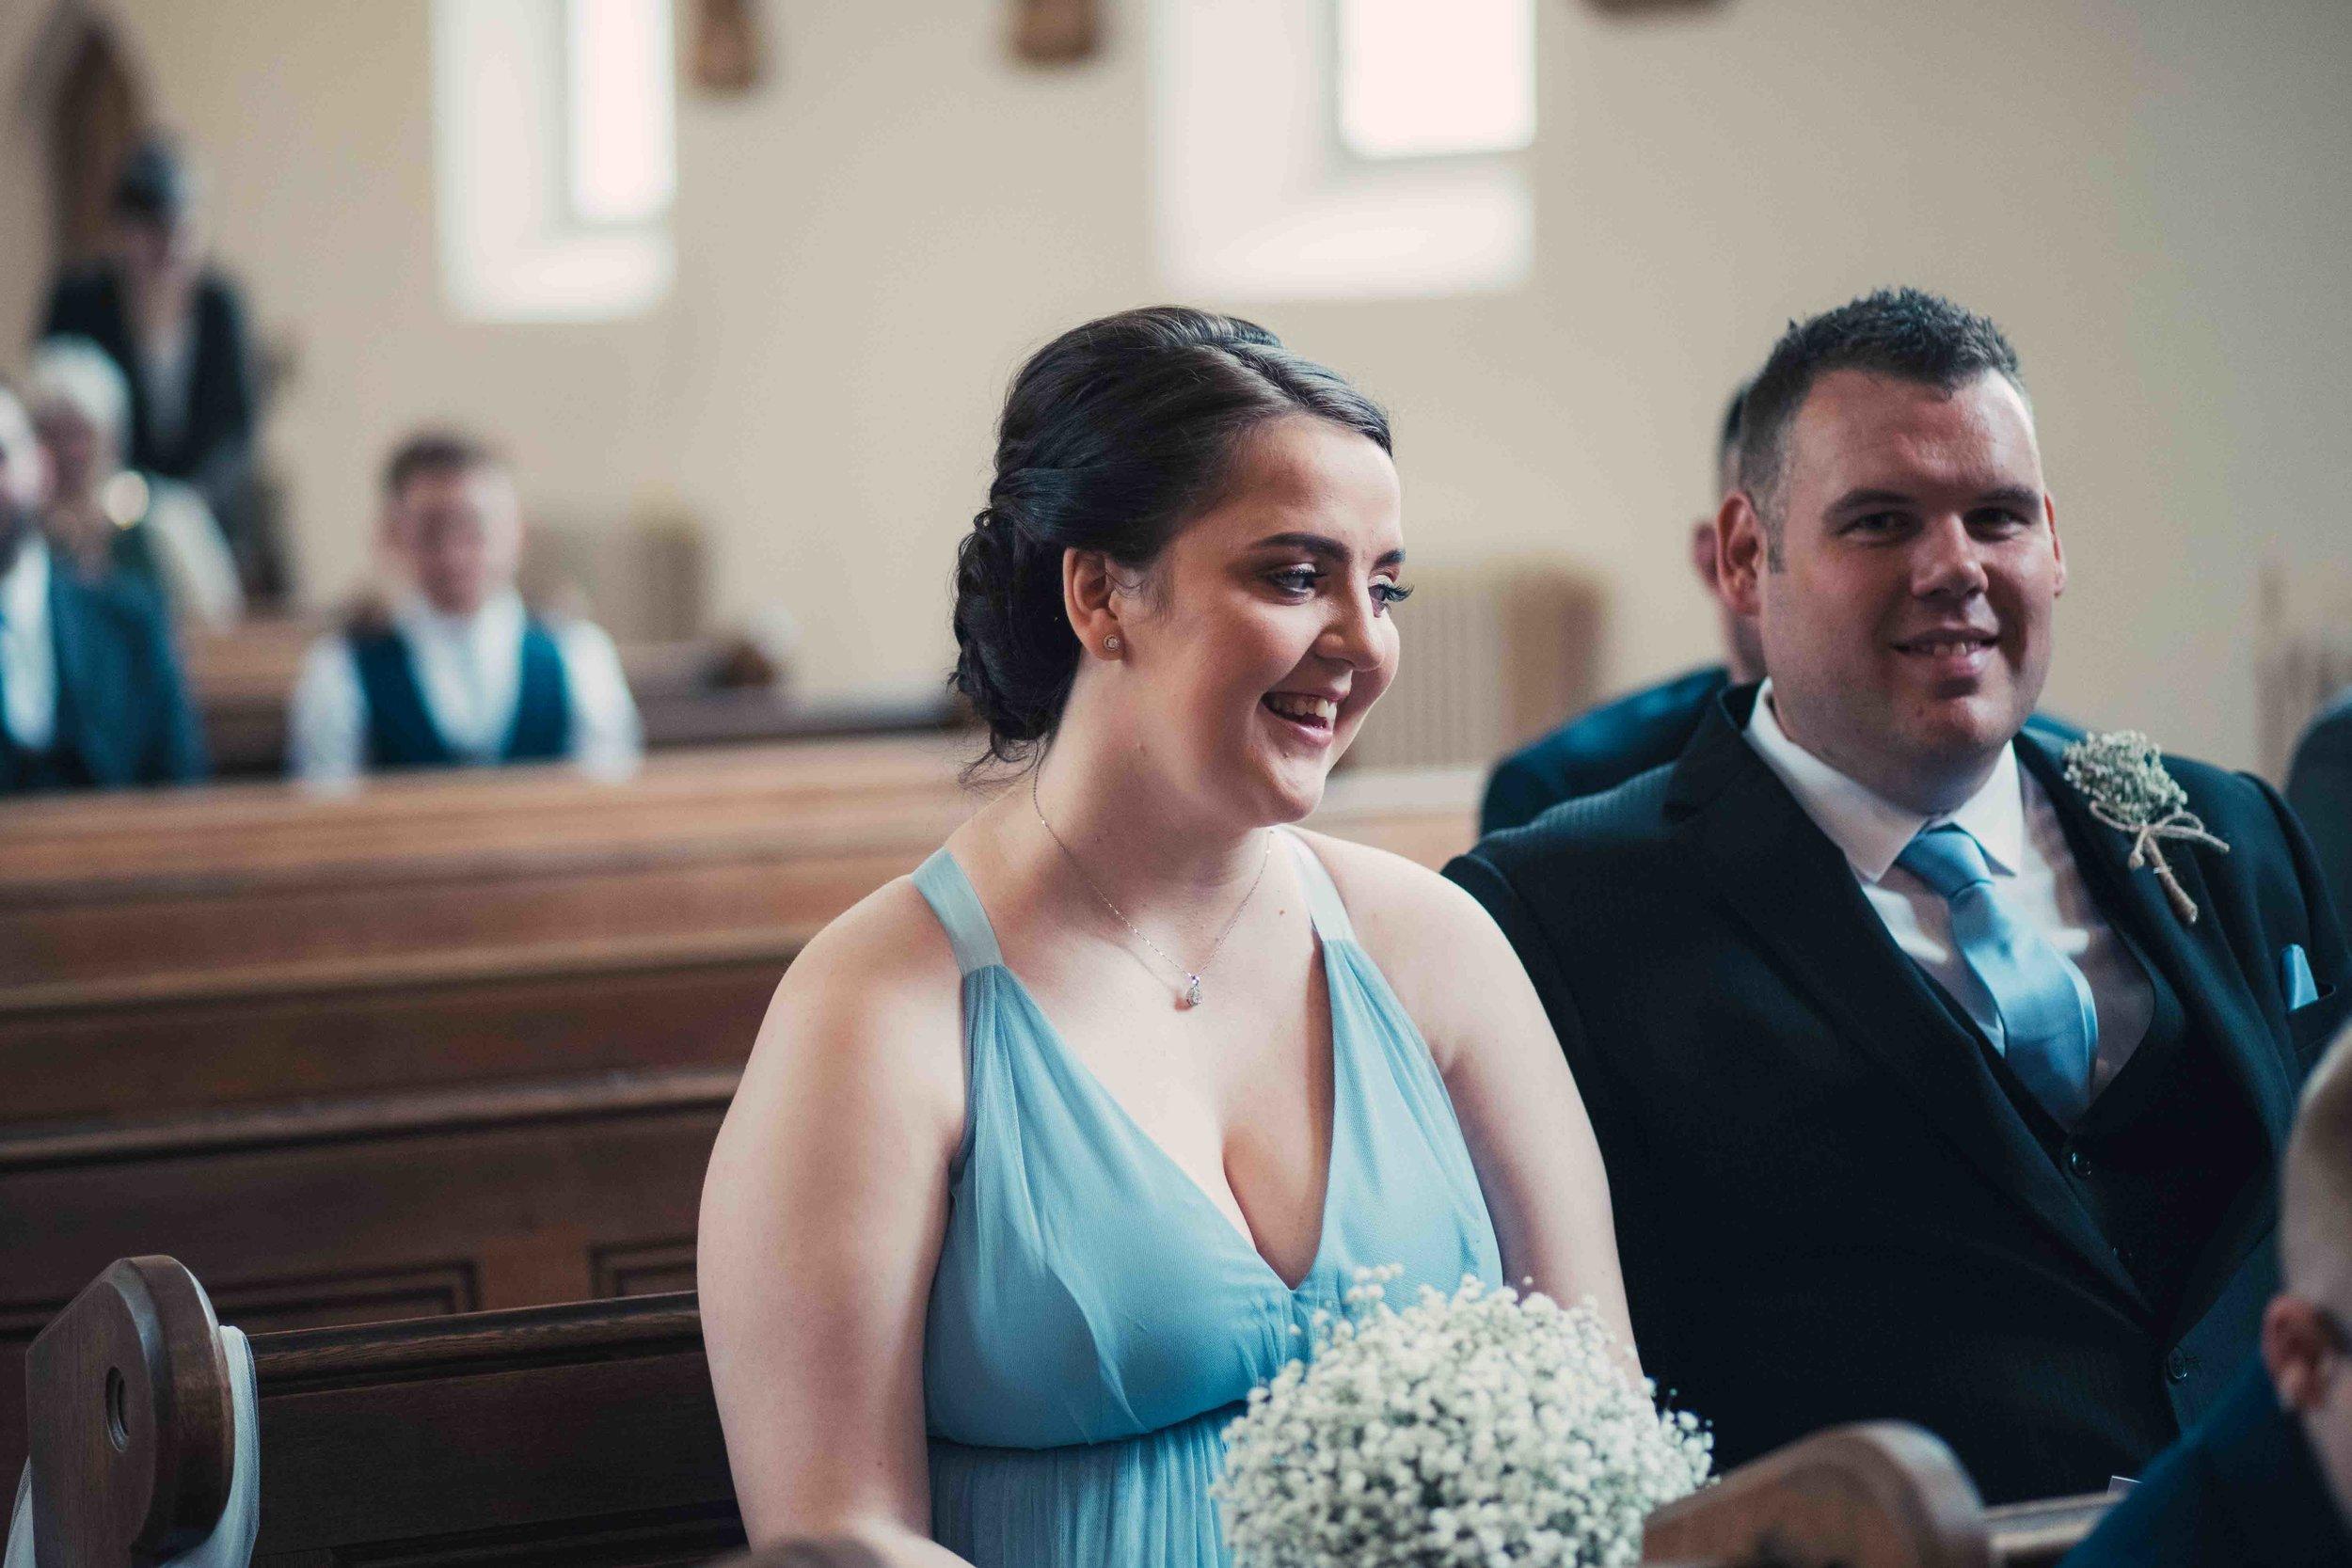 Lea-cooper-photography-willenhall-wolverhampton-wedding-photographer-birmingham-shirley-west-midlands-ceremony-church-22.JPG